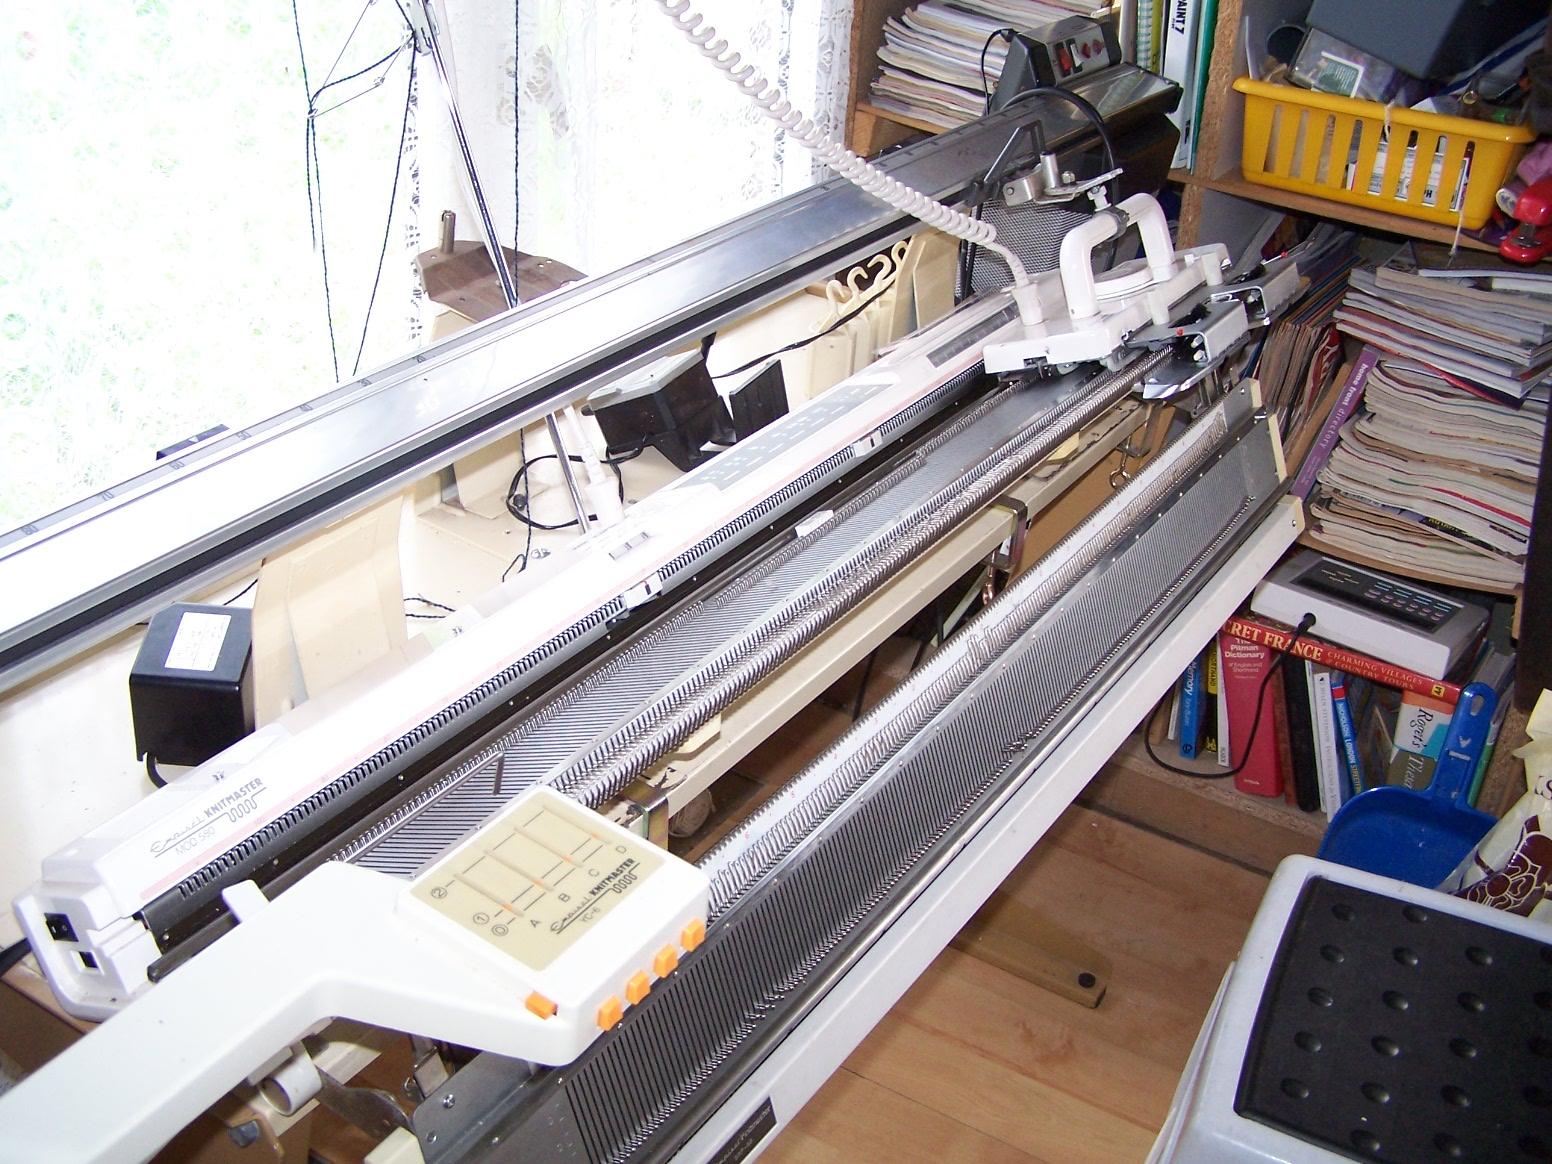 KM 580 Electronic